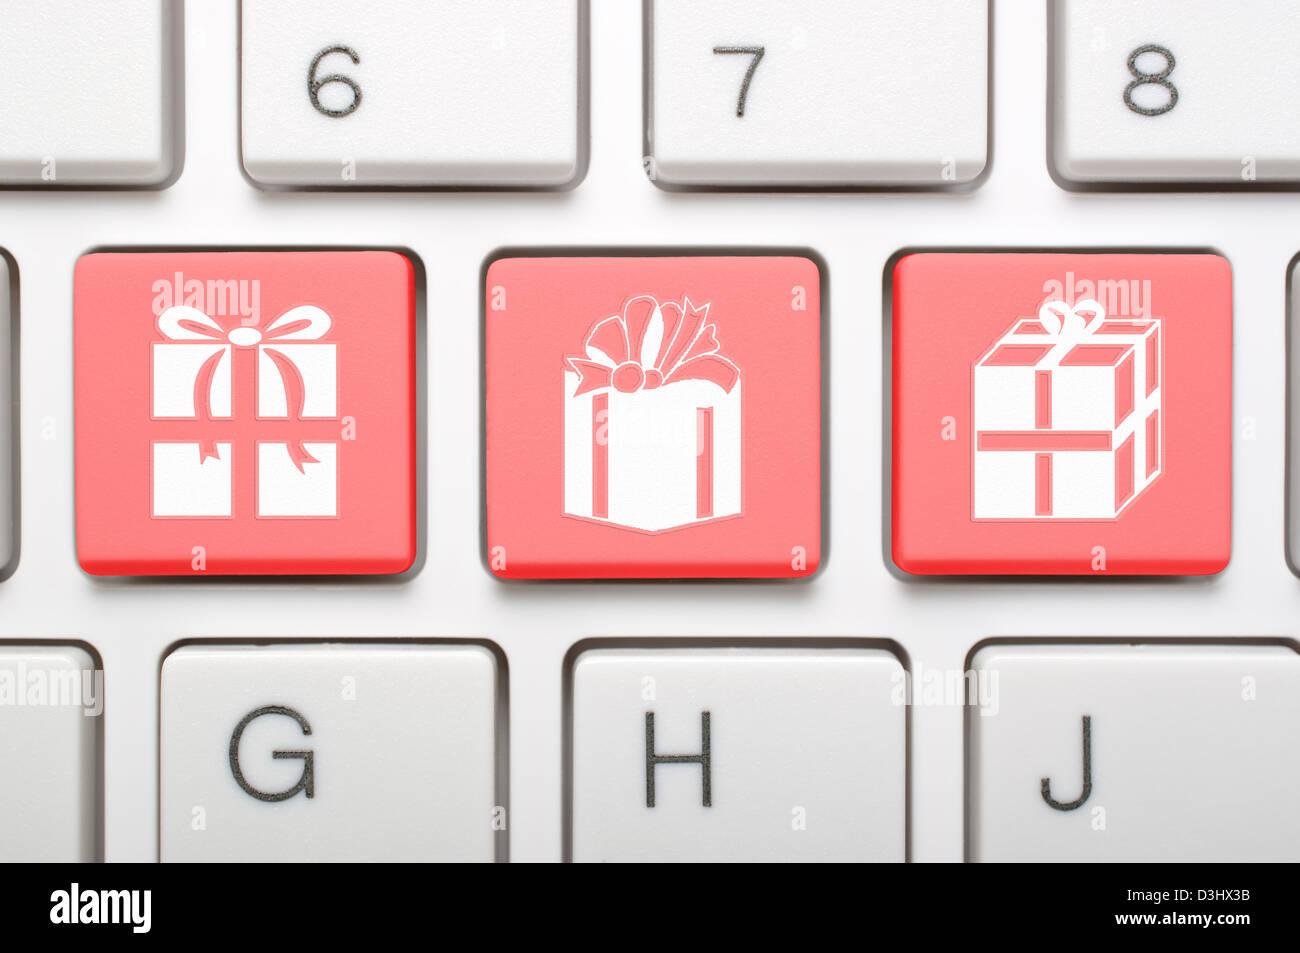 Gift Symbol On Keyboard Stock Photos Gift Symbol On Keyboard Stock